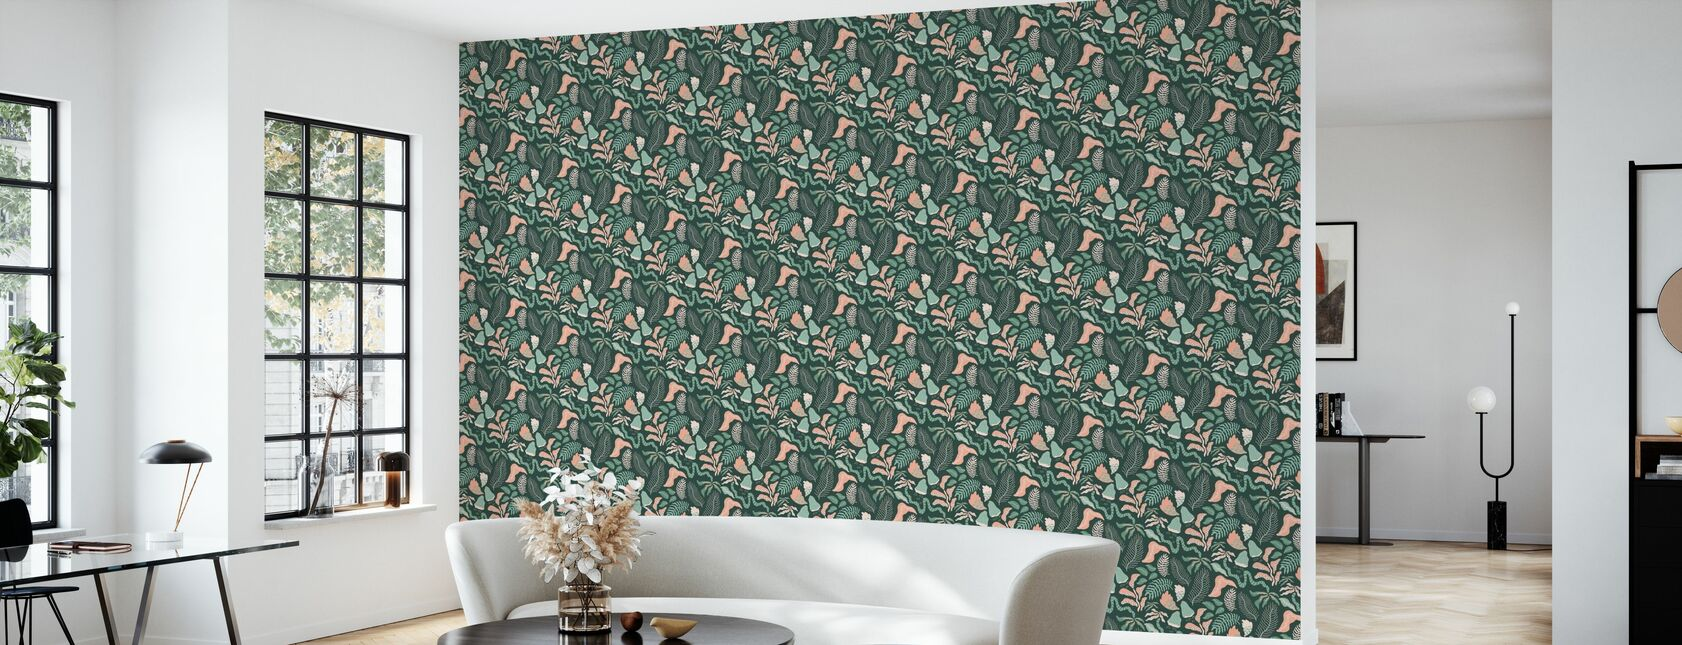 Botanica - Green - Wallpaper - Living Room